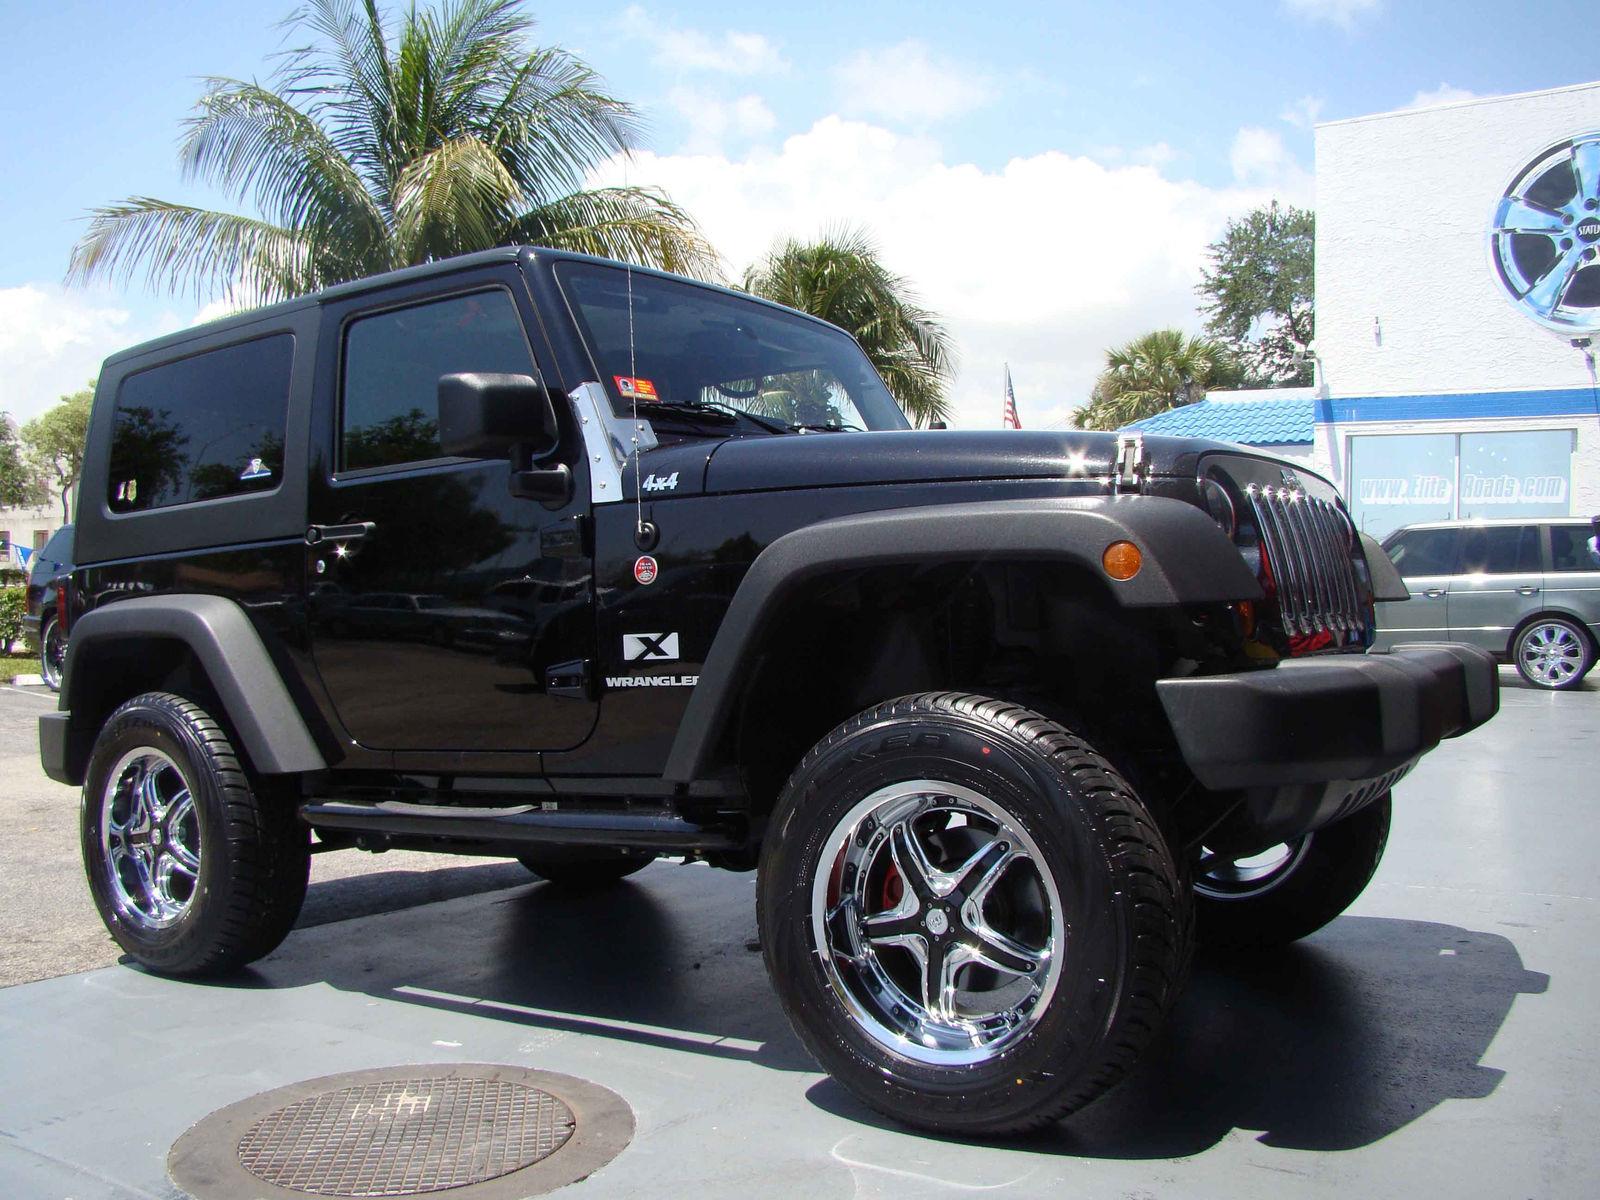 2010 Jeep Wrangler | Jeep Wrangler